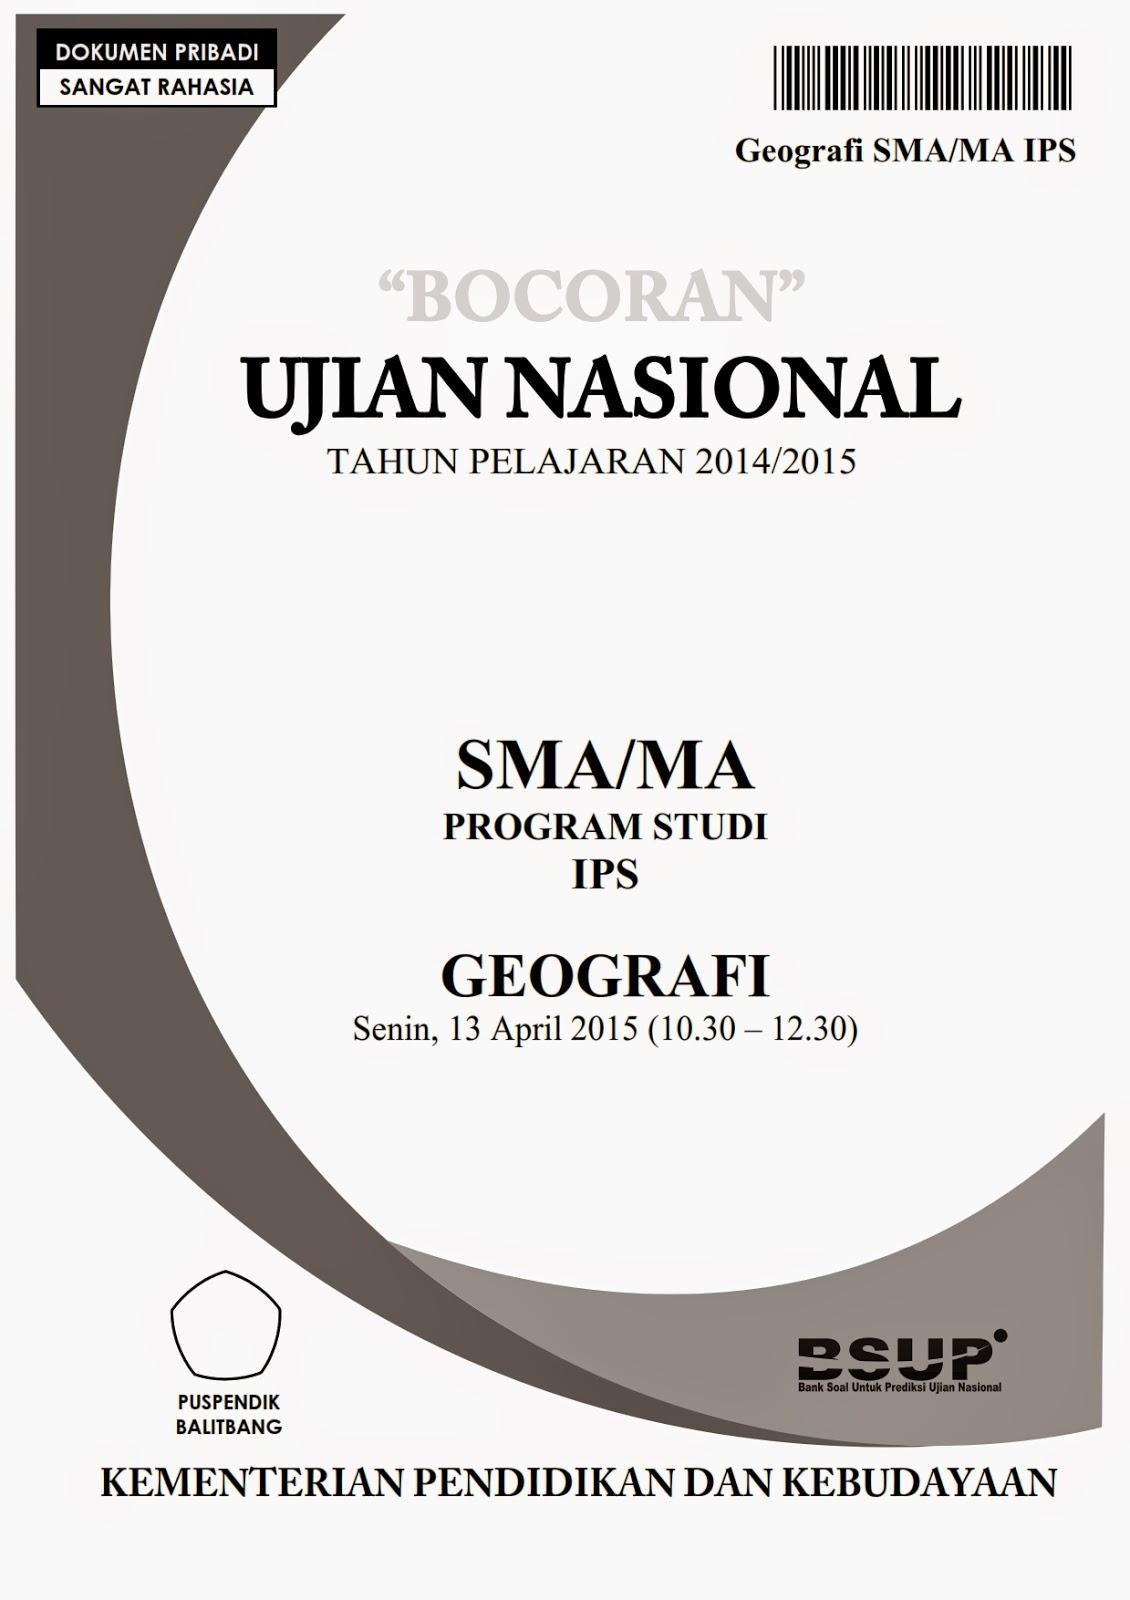 Berbagi Dan Belajar Quot Bocoran Quot Soal Un Geografi Sma 2015